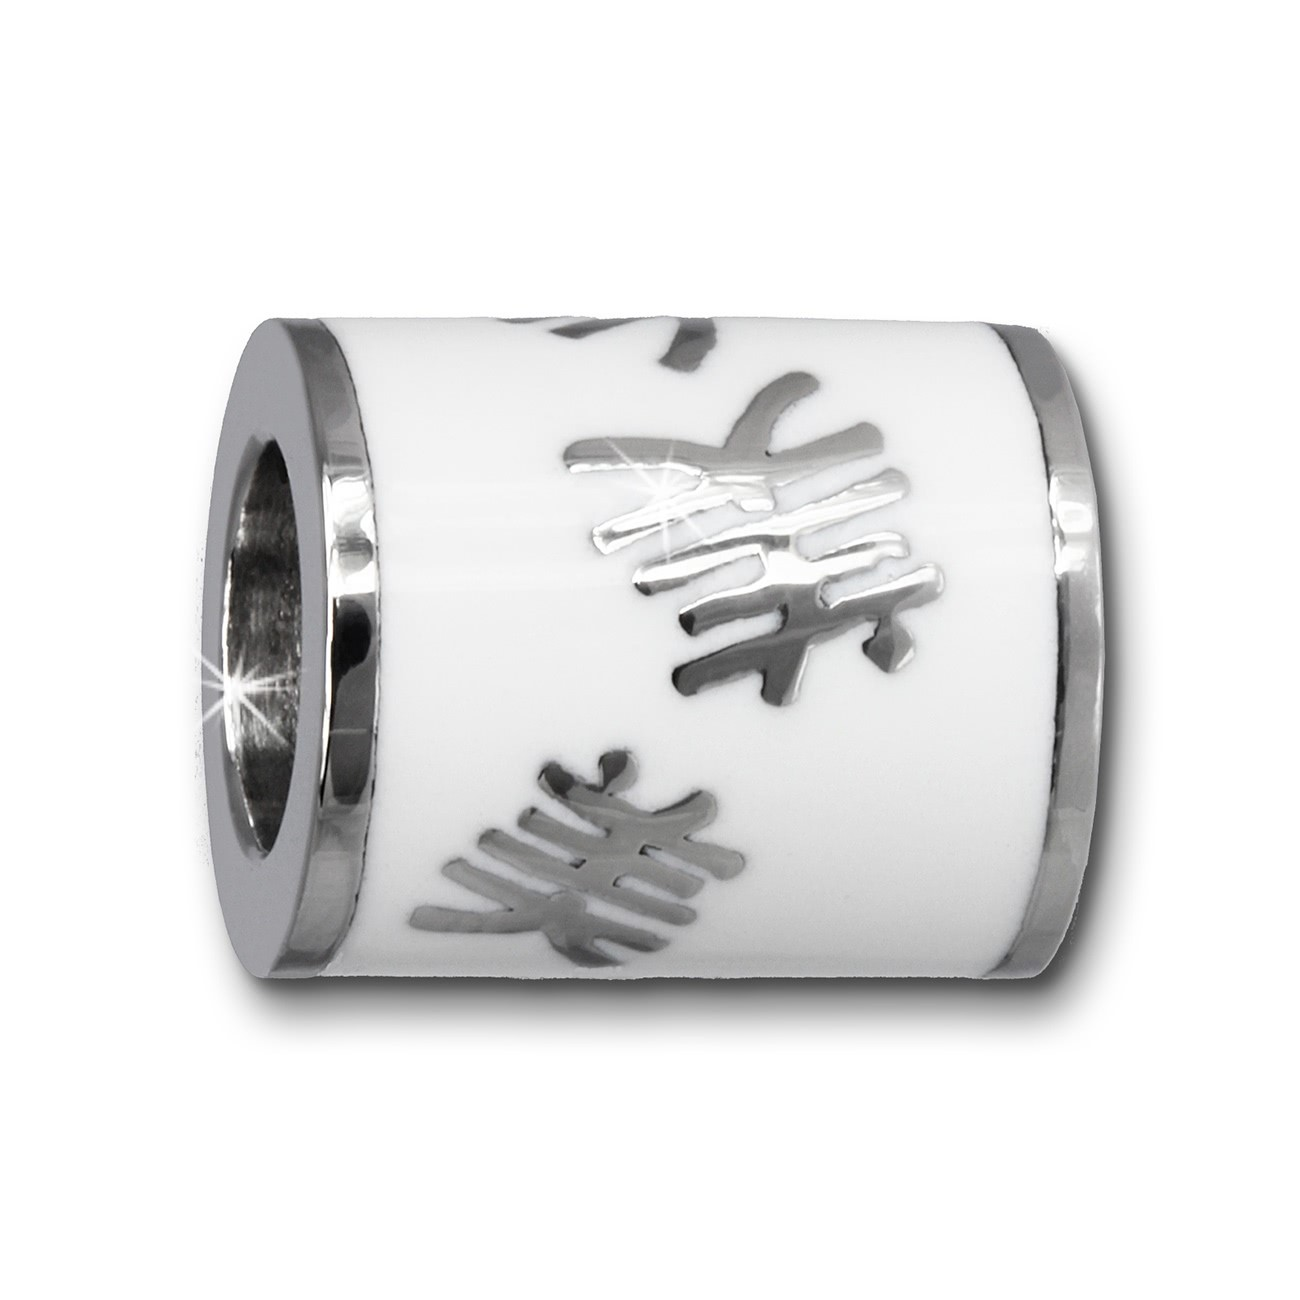 Amello Megabeads Stahl Bead chinesisch Schönheit Armbandbead AMB231W